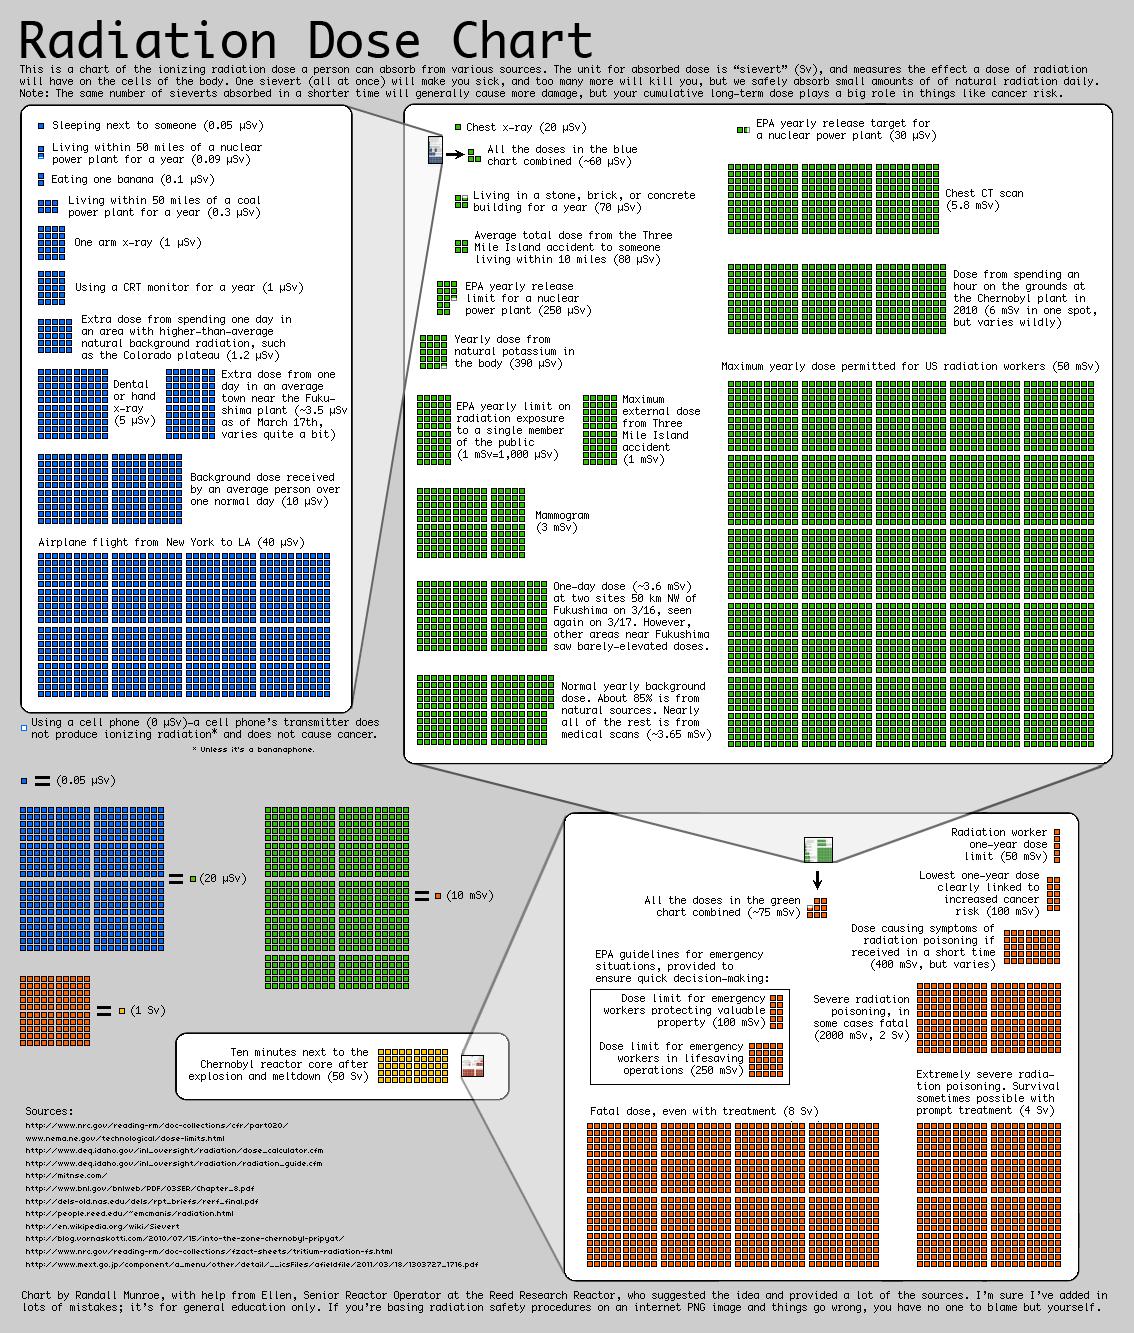 Radiation Dose Chart Radiation Dose Radiation Exposure Radiation